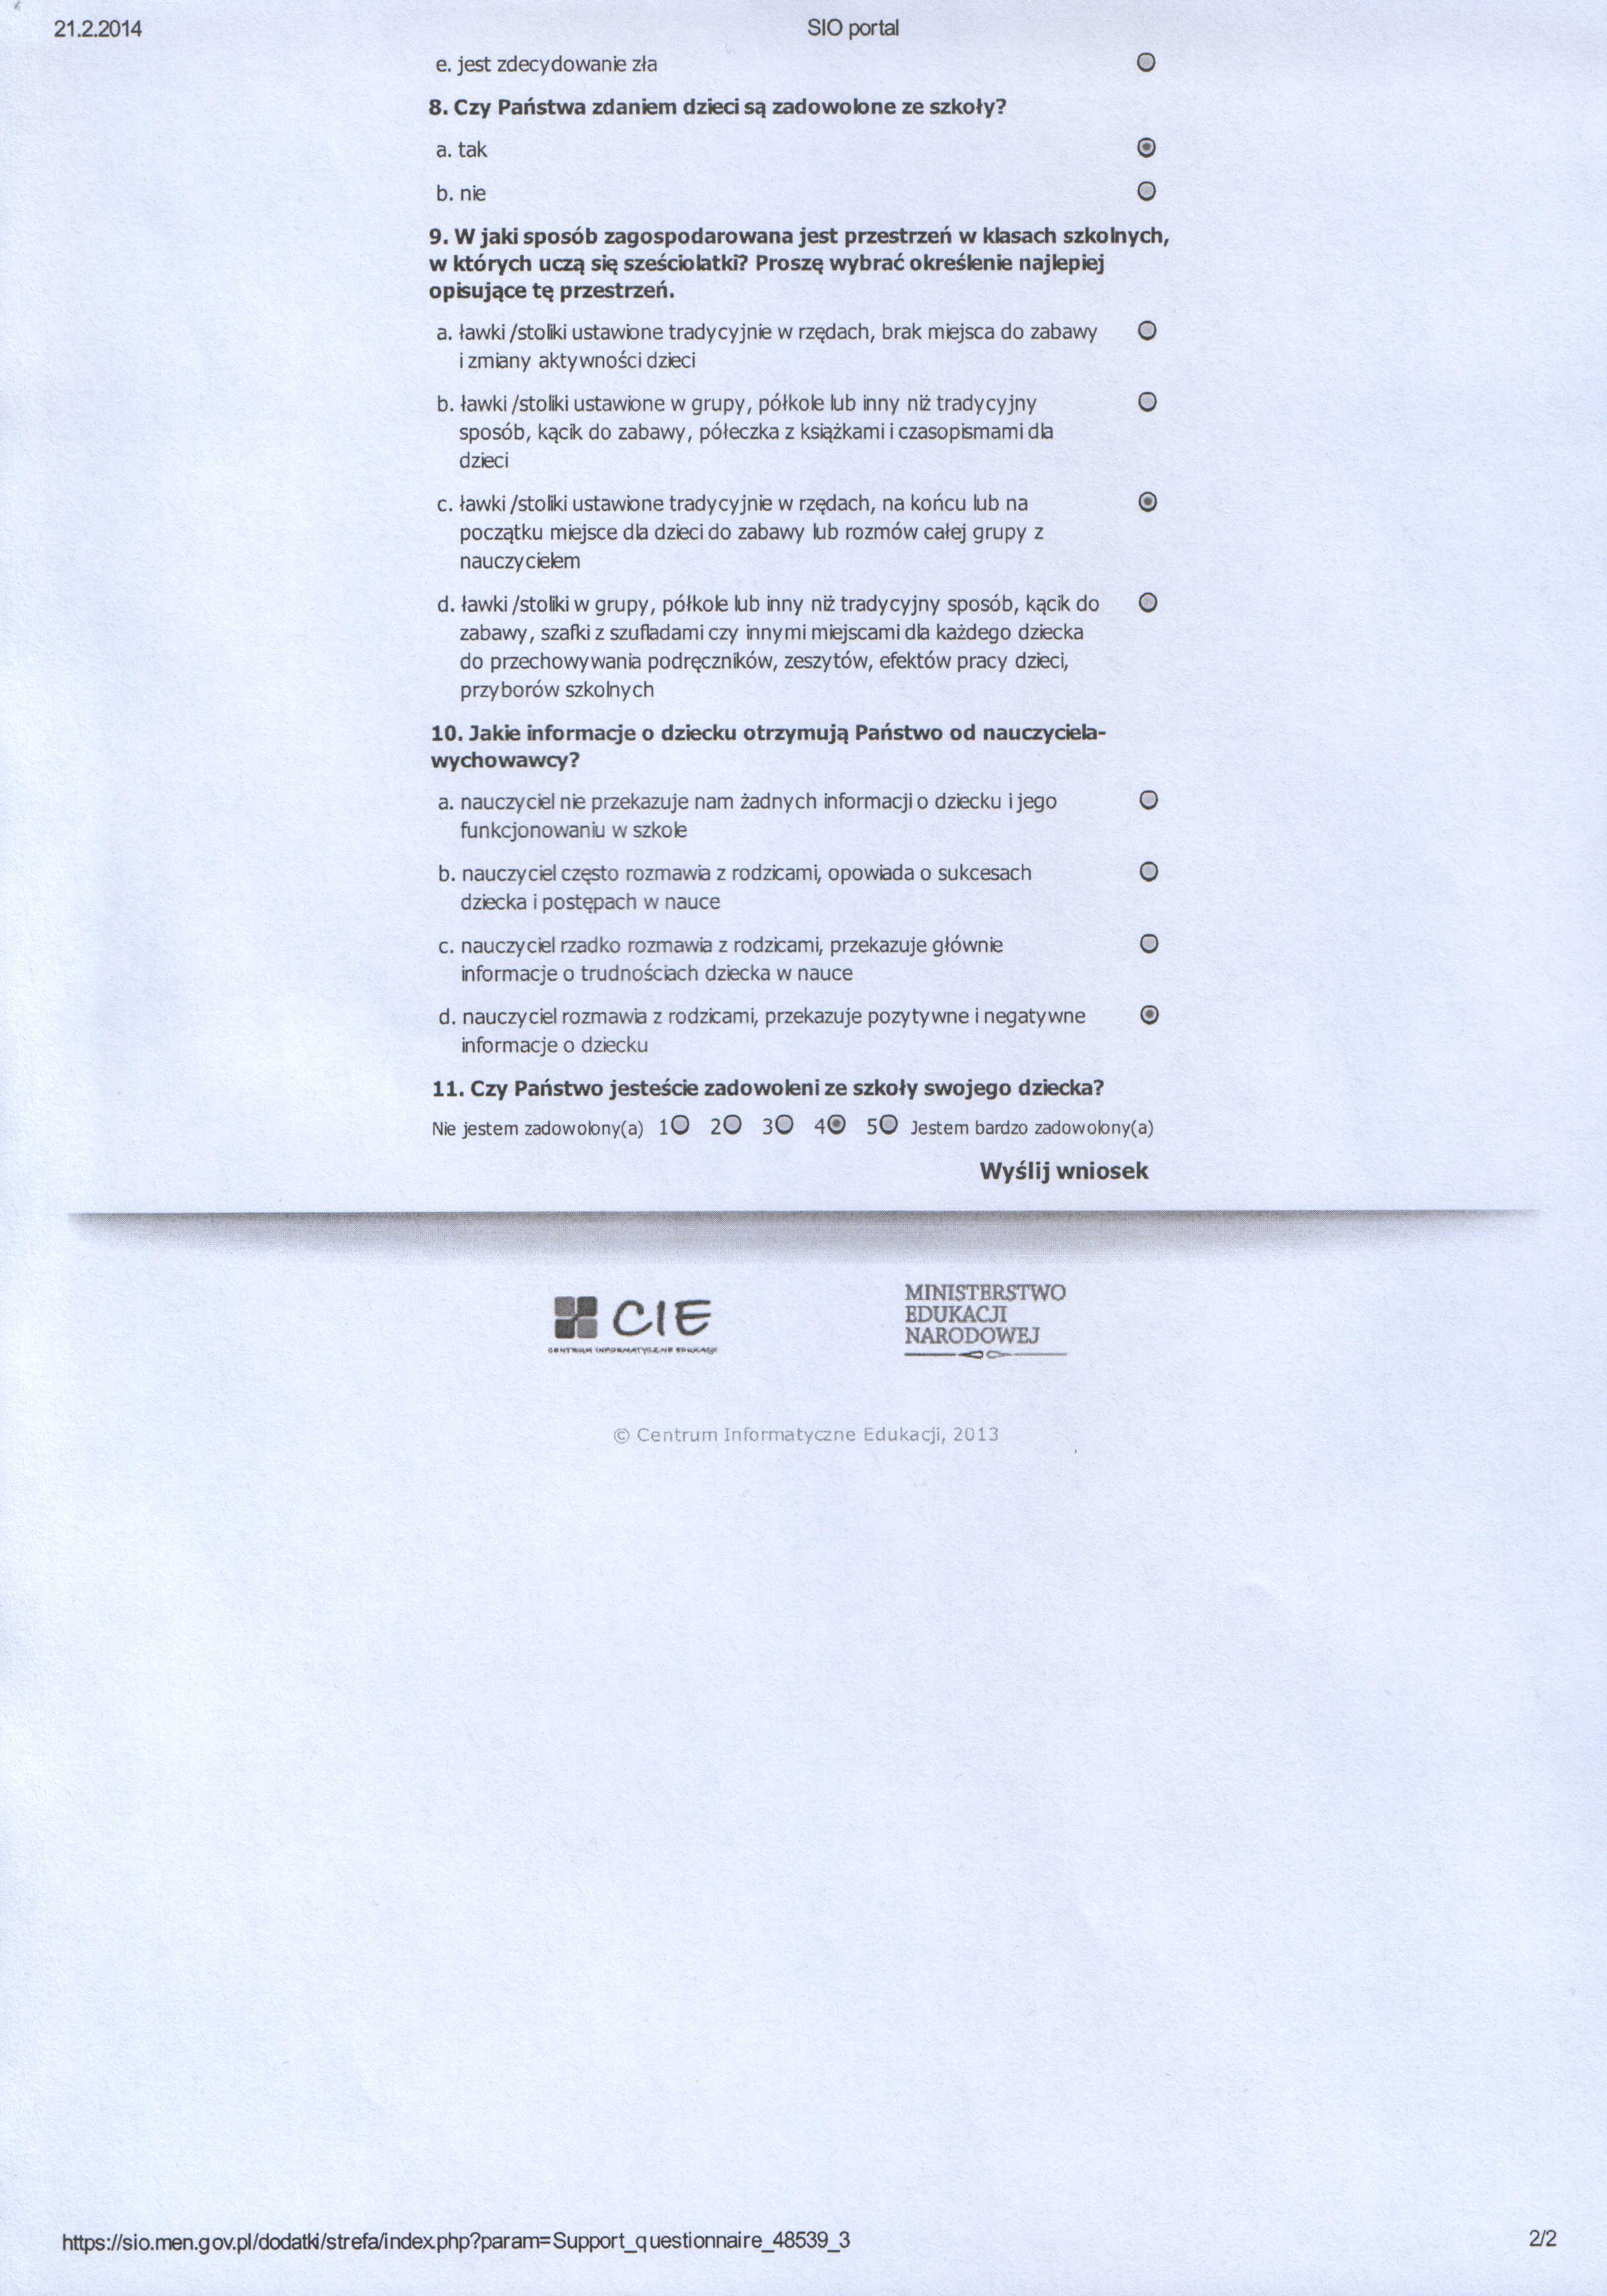 ankieta str 2